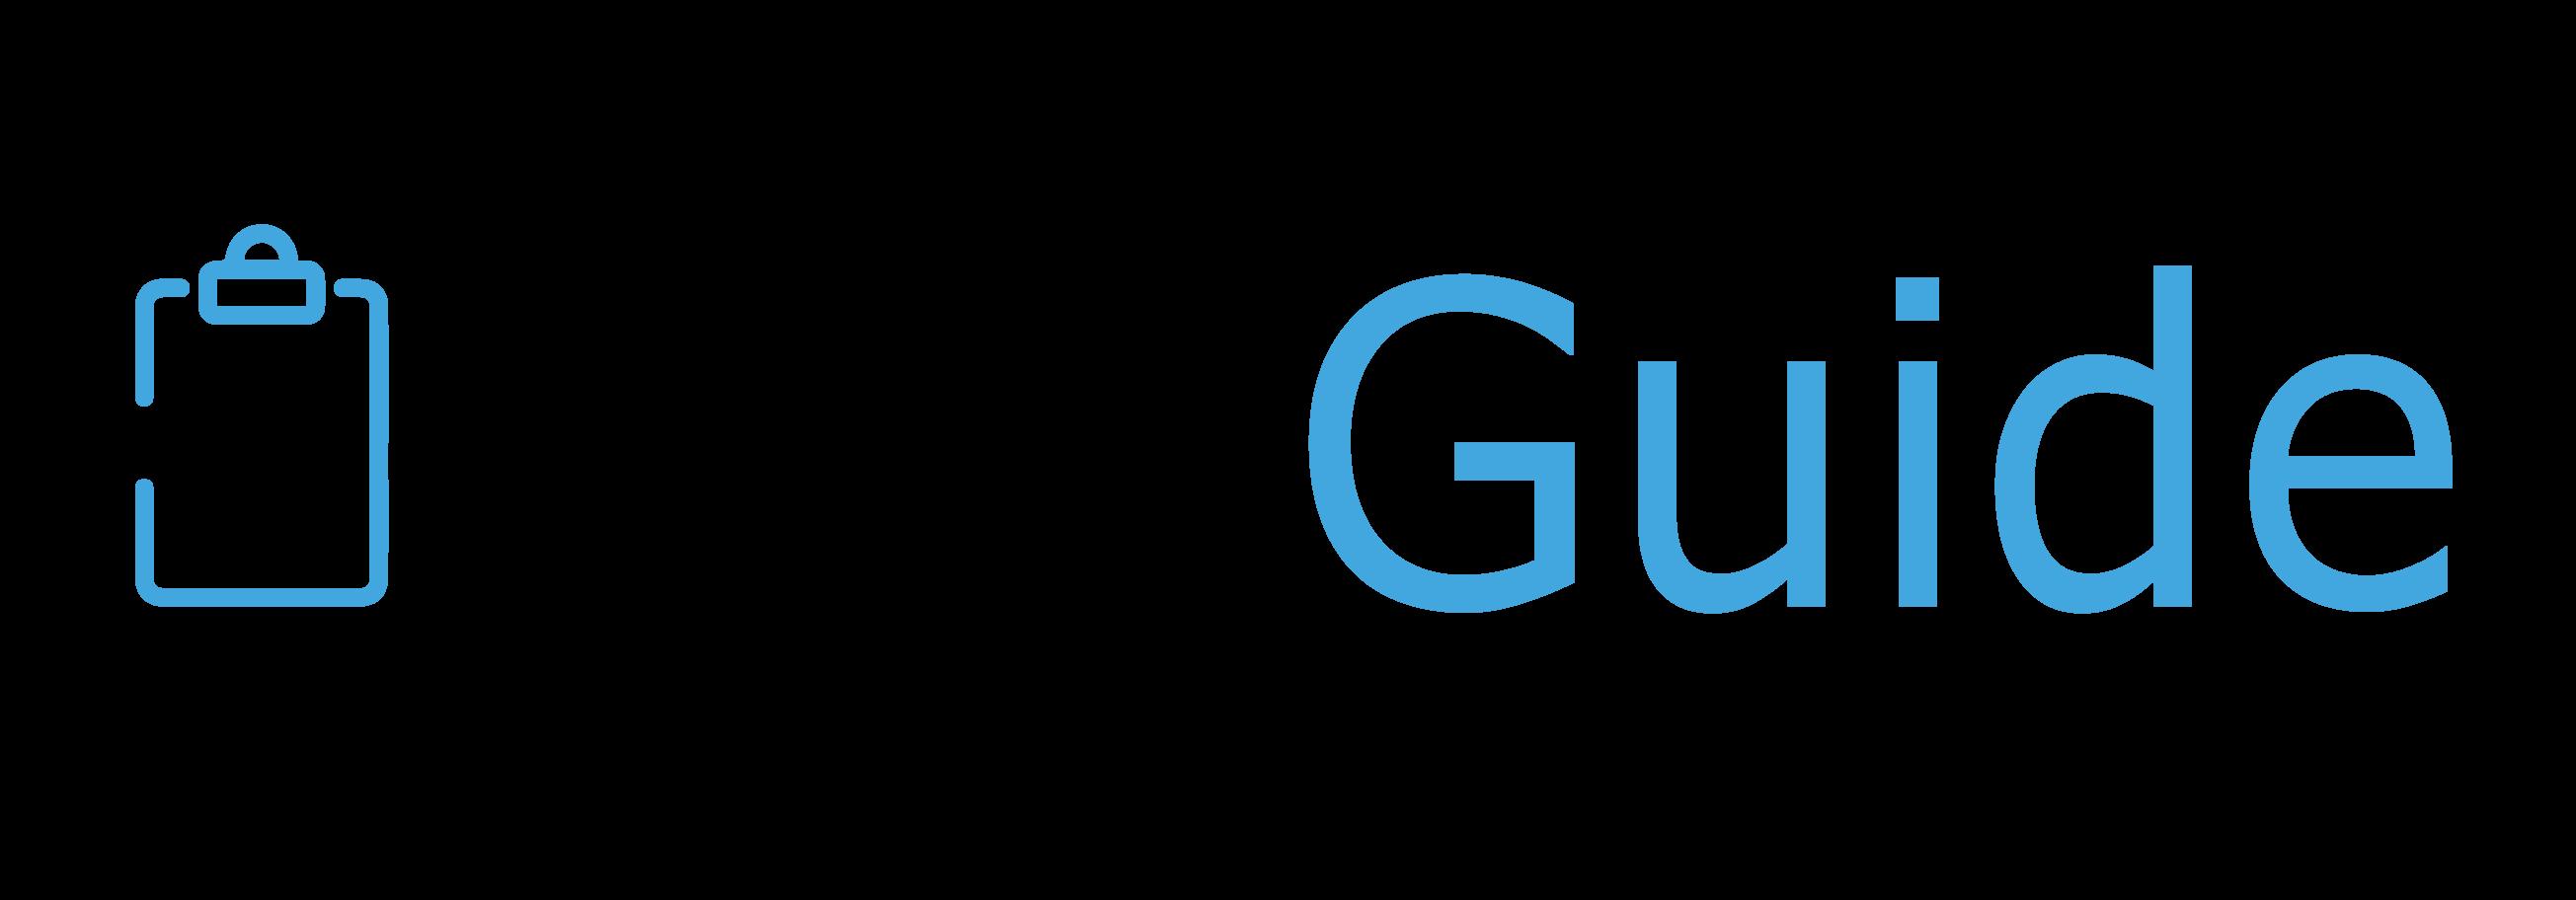 www.ehrguide.org